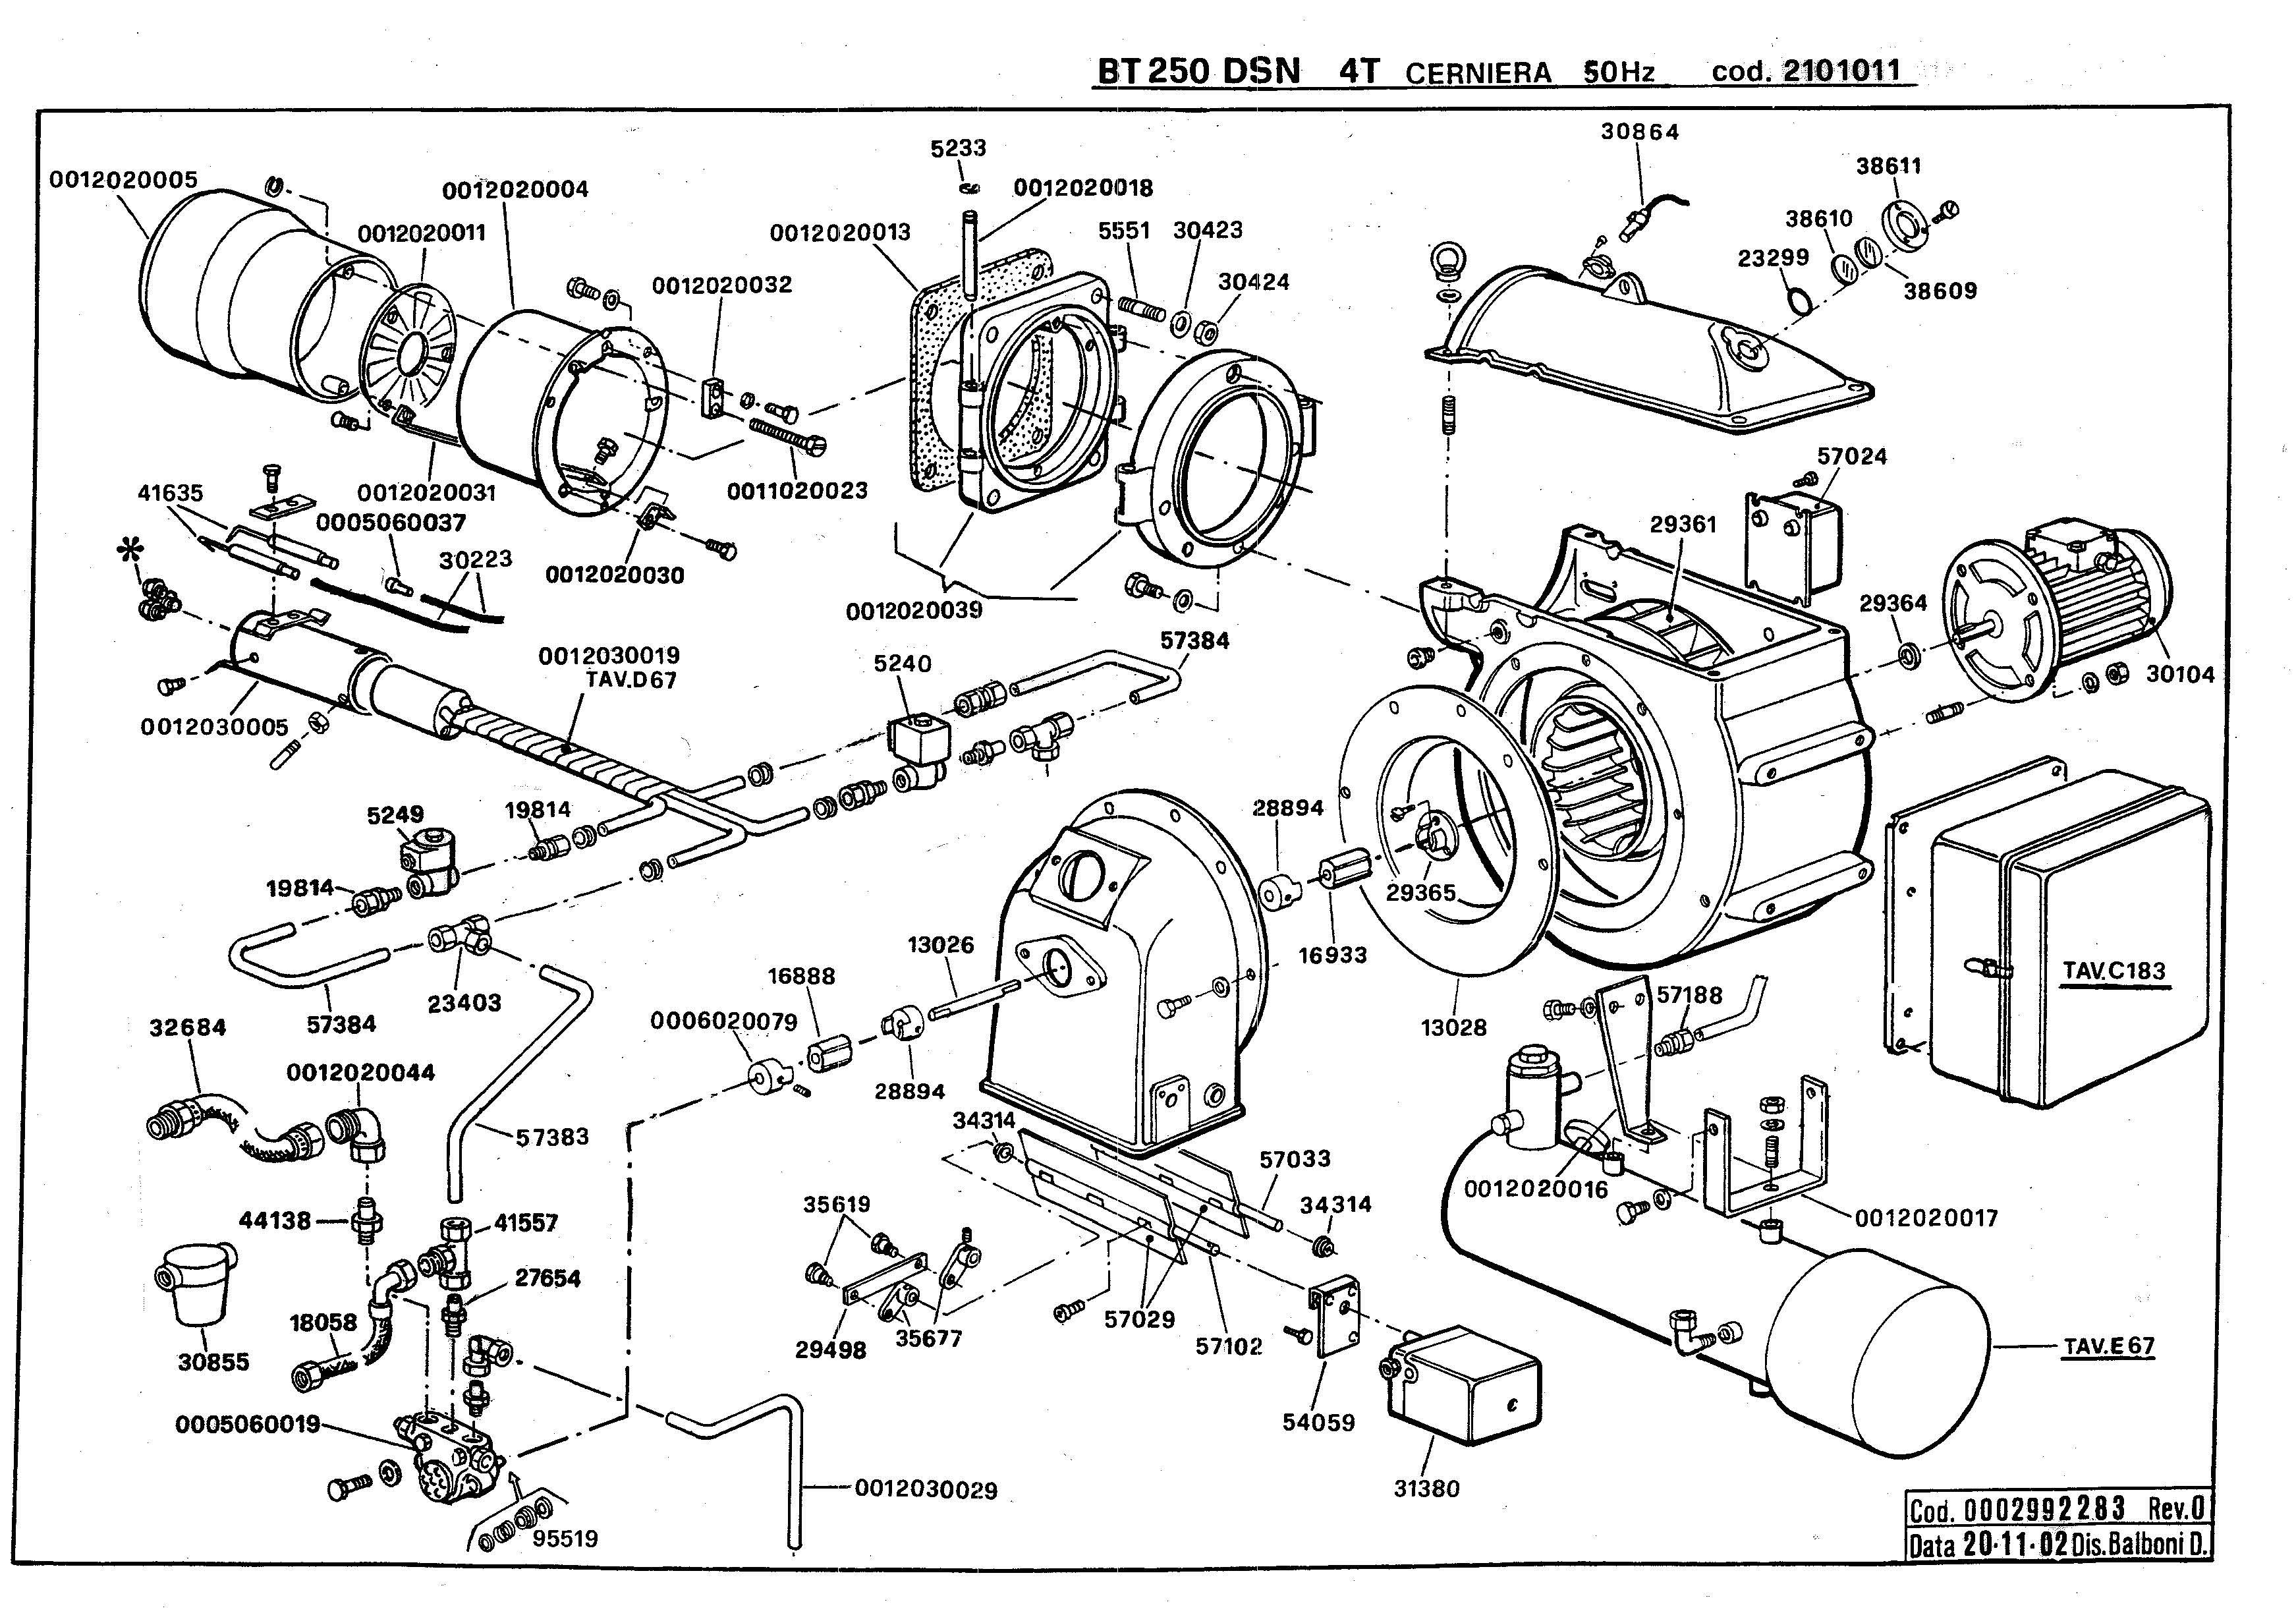 BT 250 DSN 4T Cerniera 2101011 0 20021120